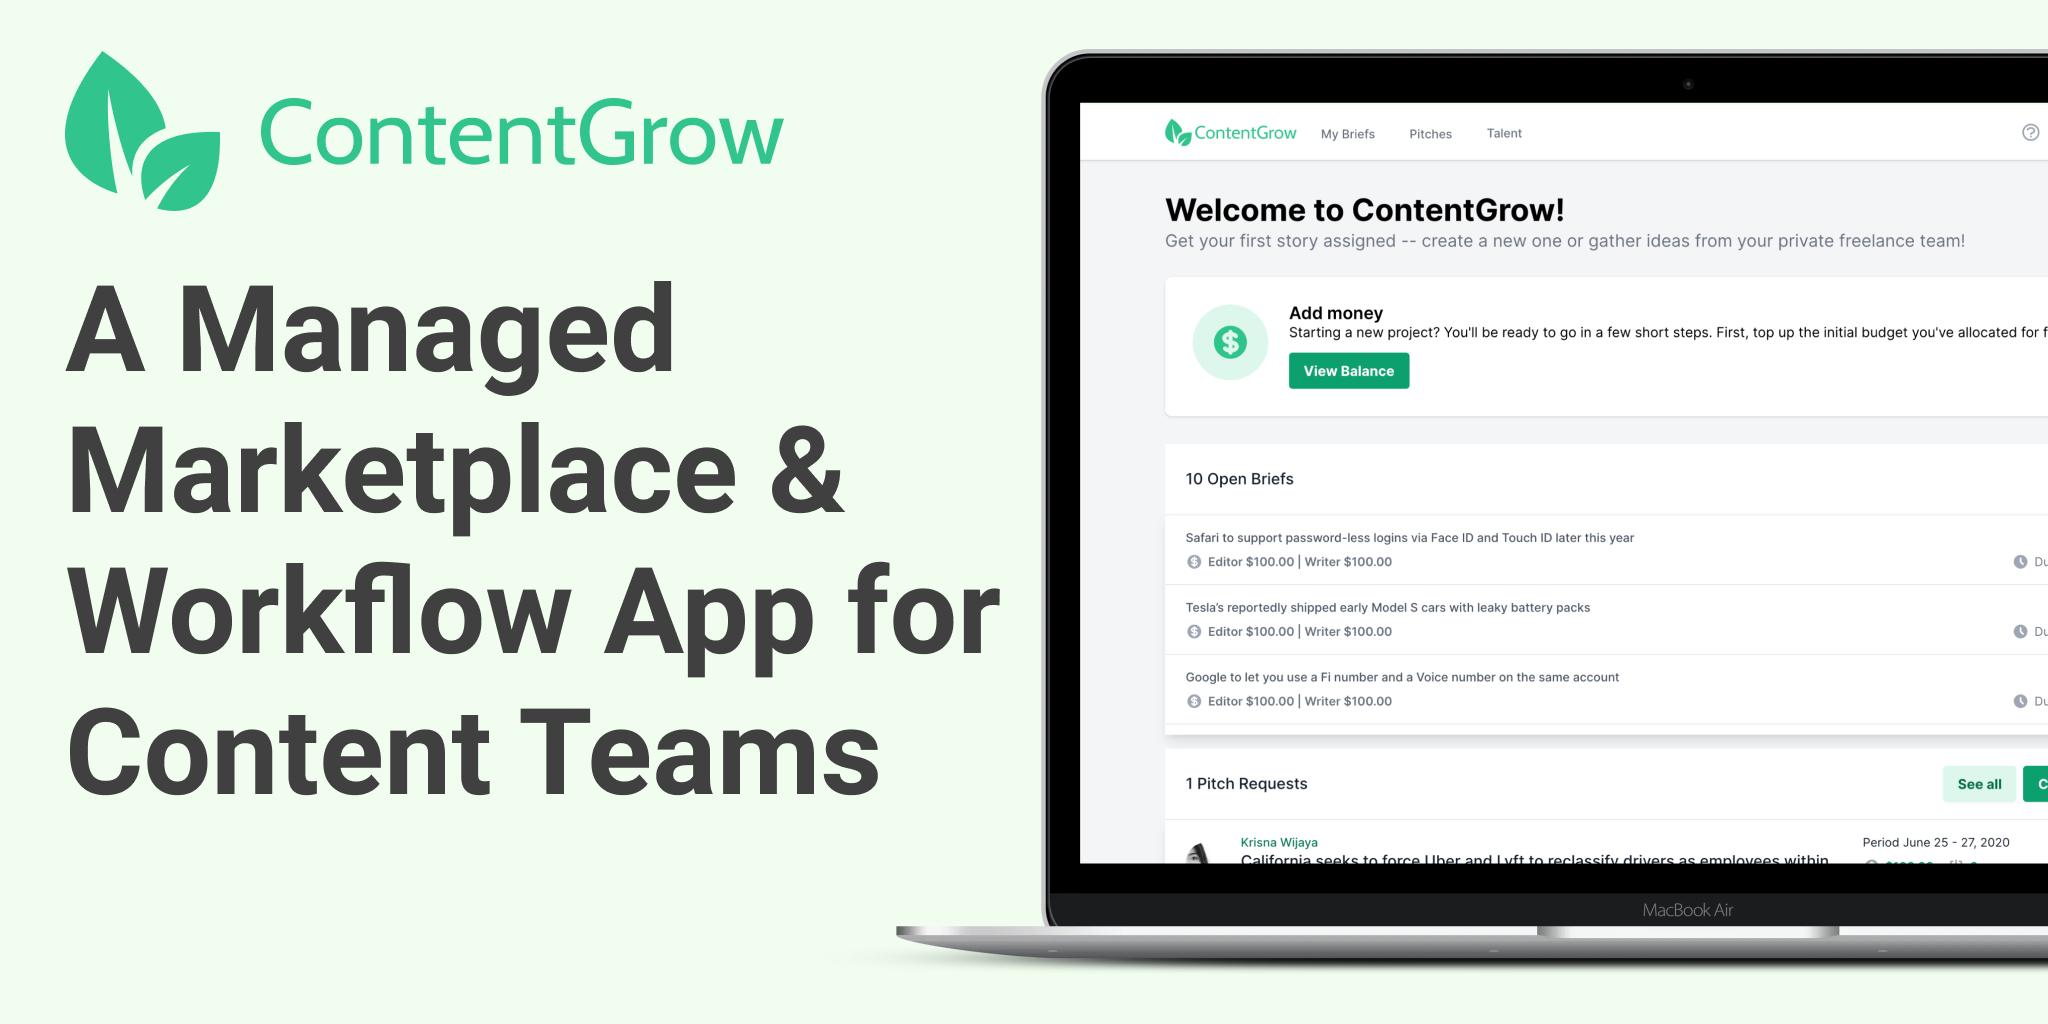 contentgrow-content-marketing